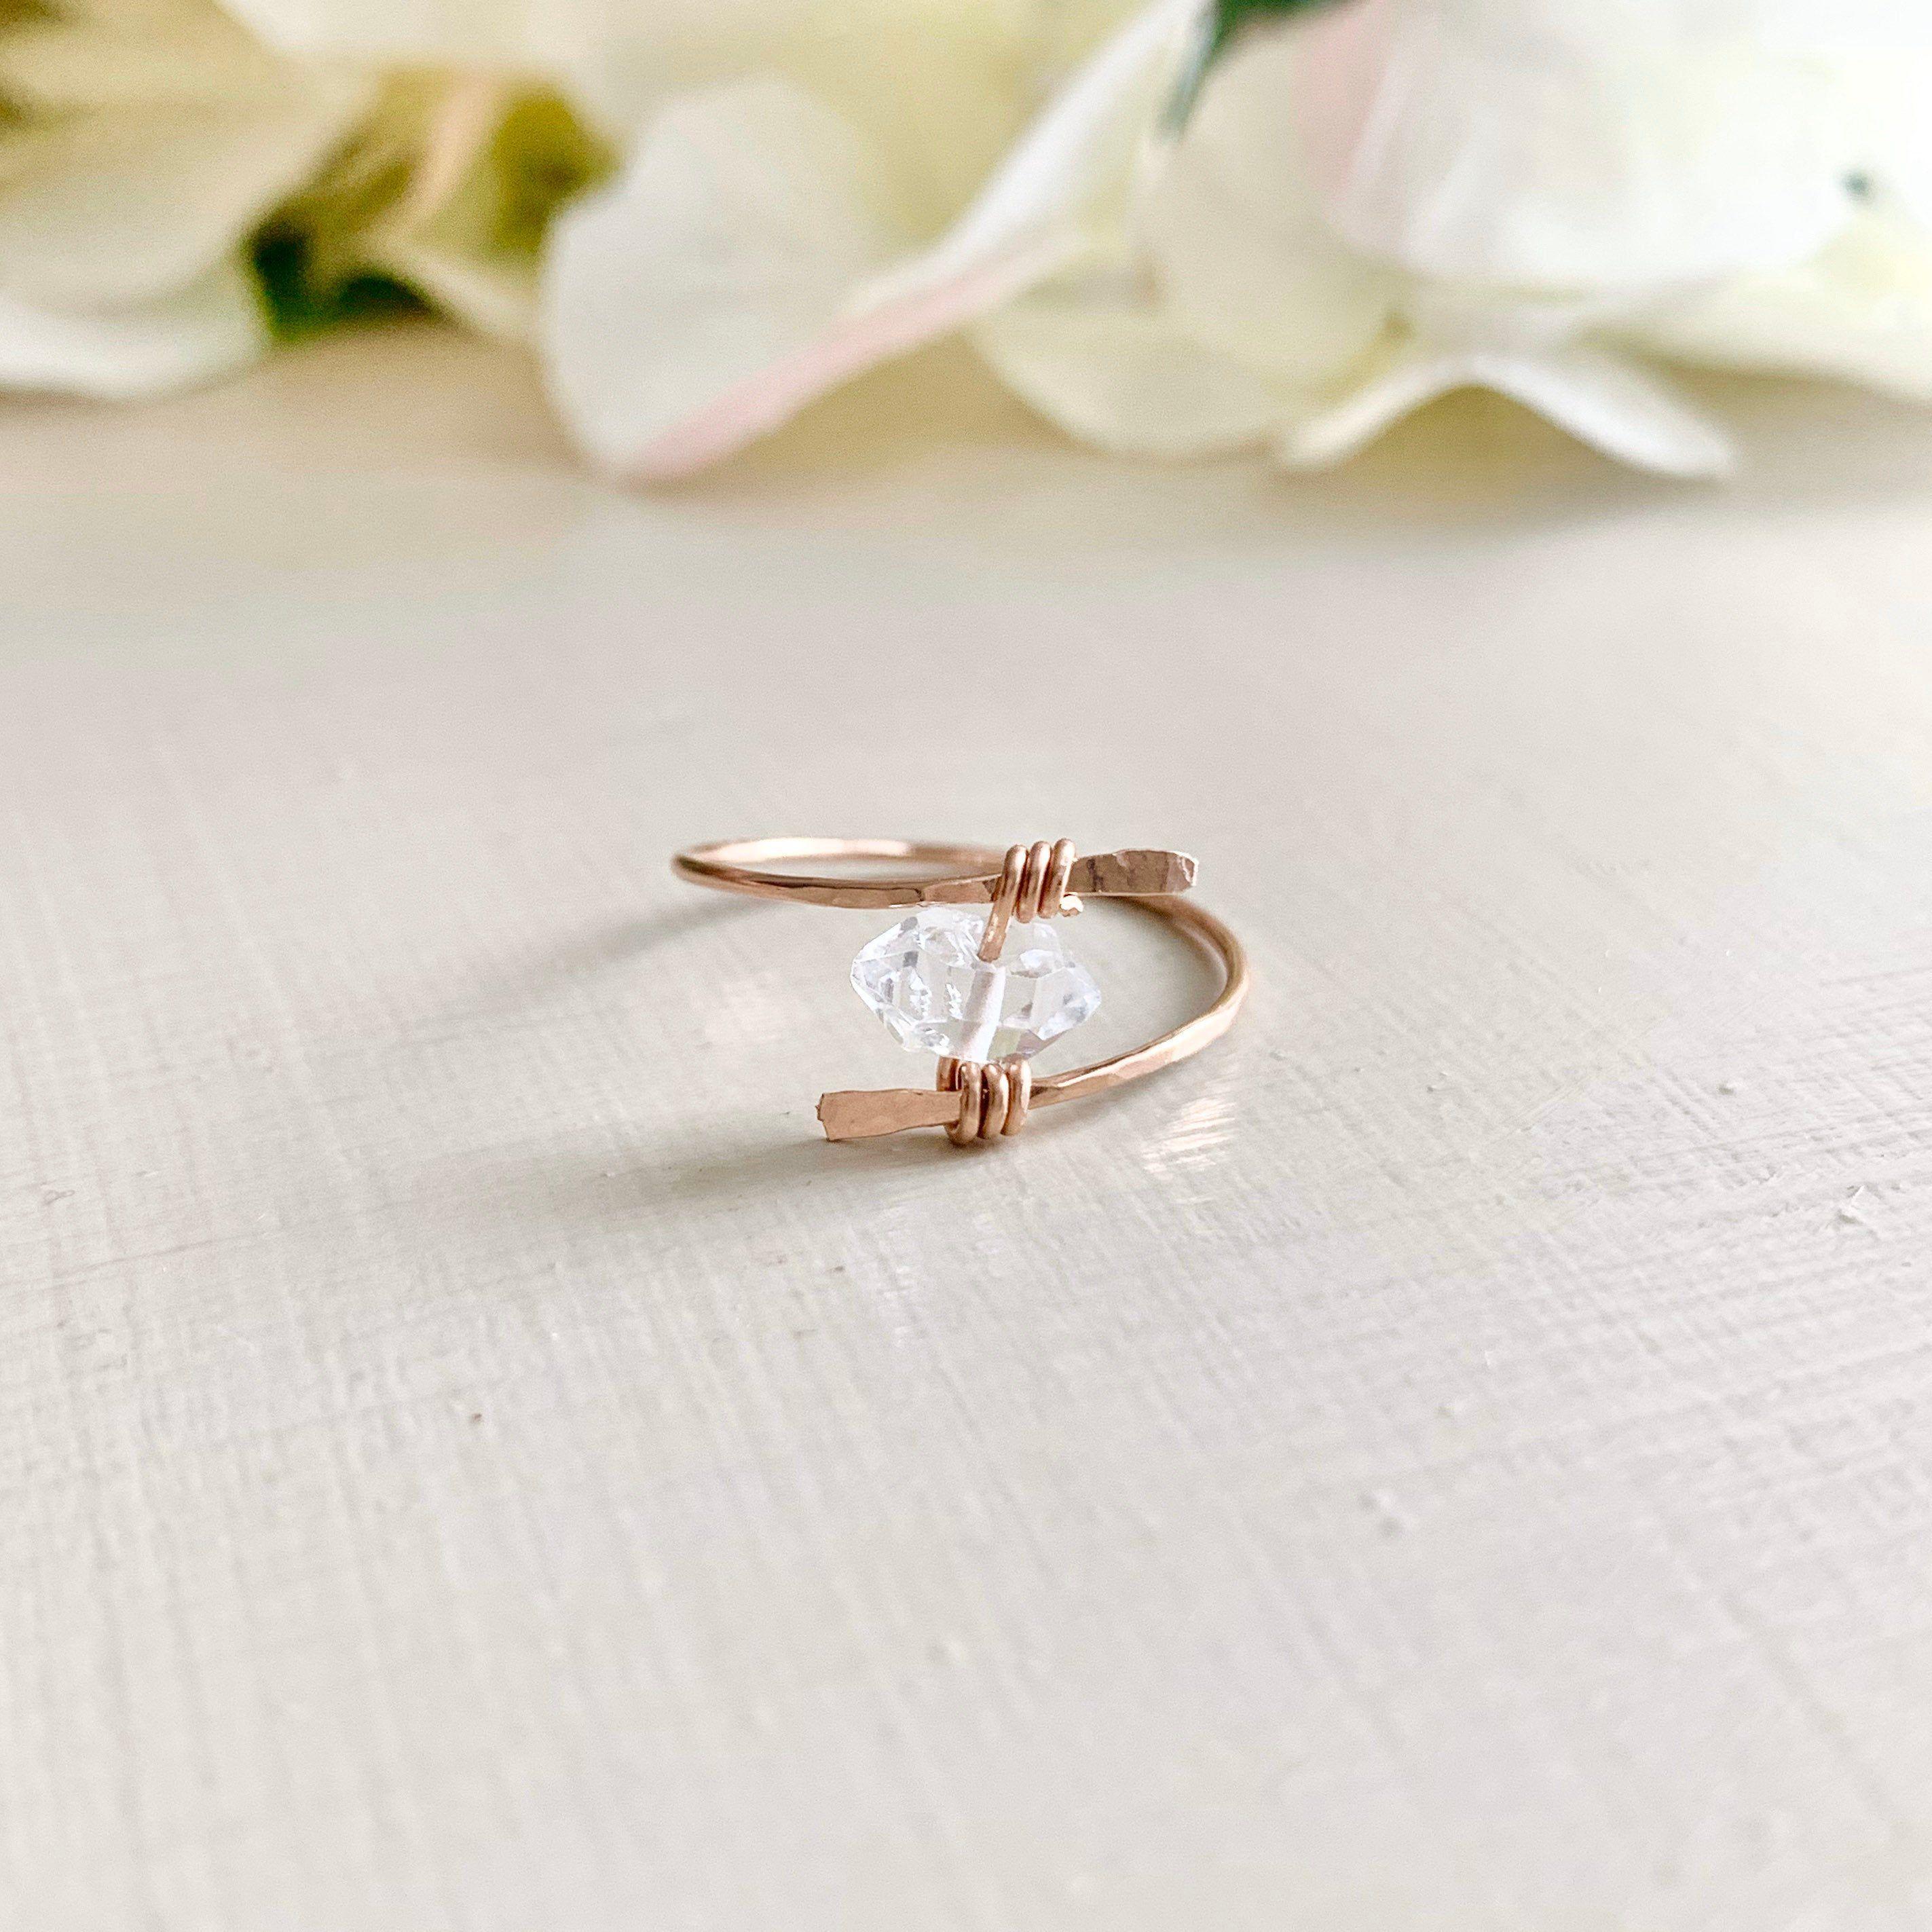 Cyber Monday Quartz Crystal Herkimer Diamond Ring Rose Gold Herkimer Diamond Rings Double Terminated Ring Raw Crystal Ring Engagement Gift In 2020 Raw Crystal Ring Raw Crystal Ring Engagement Herkimer Diamond Ring